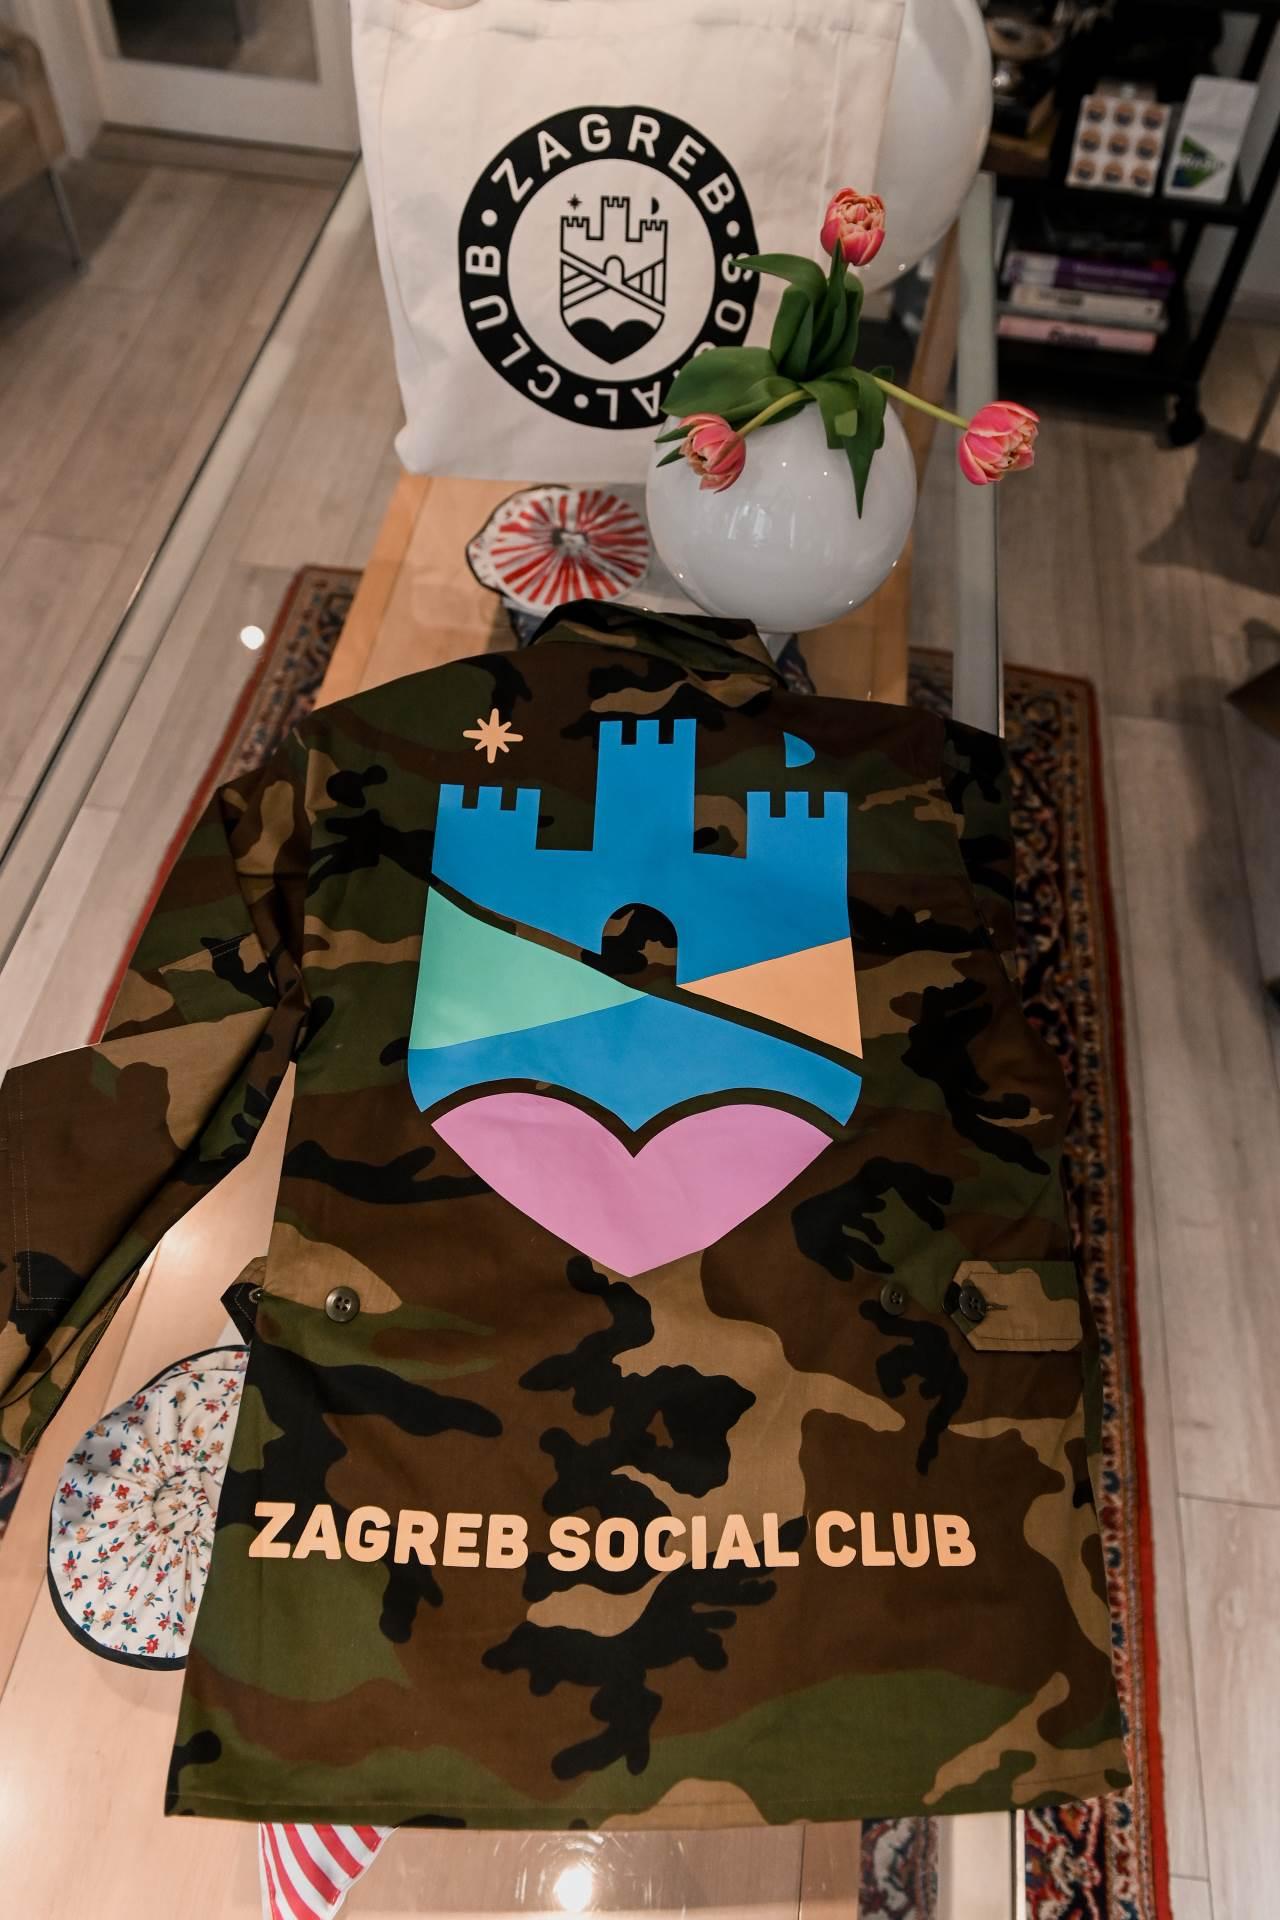 Zagreb Social Club